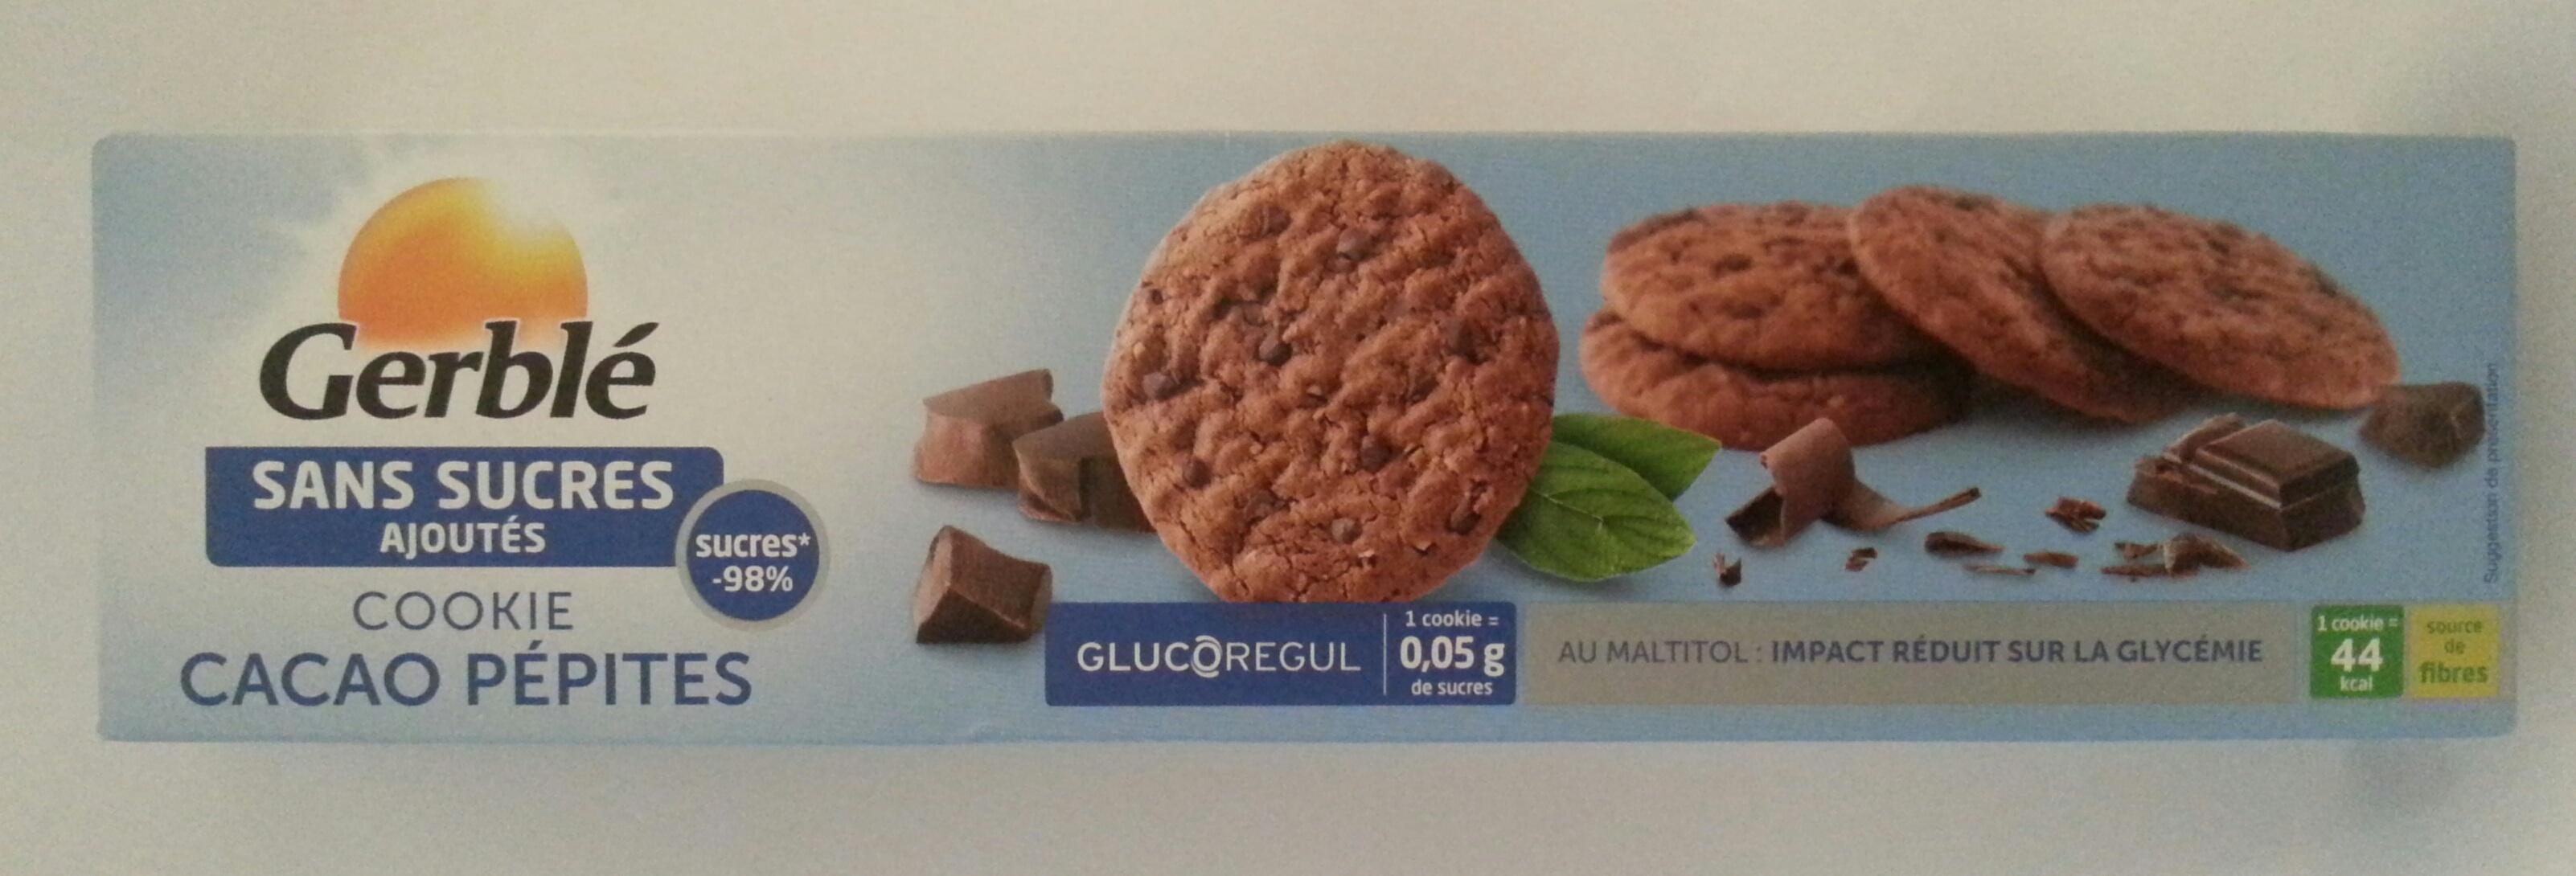 Cookie cacao pépites - Producto - fr